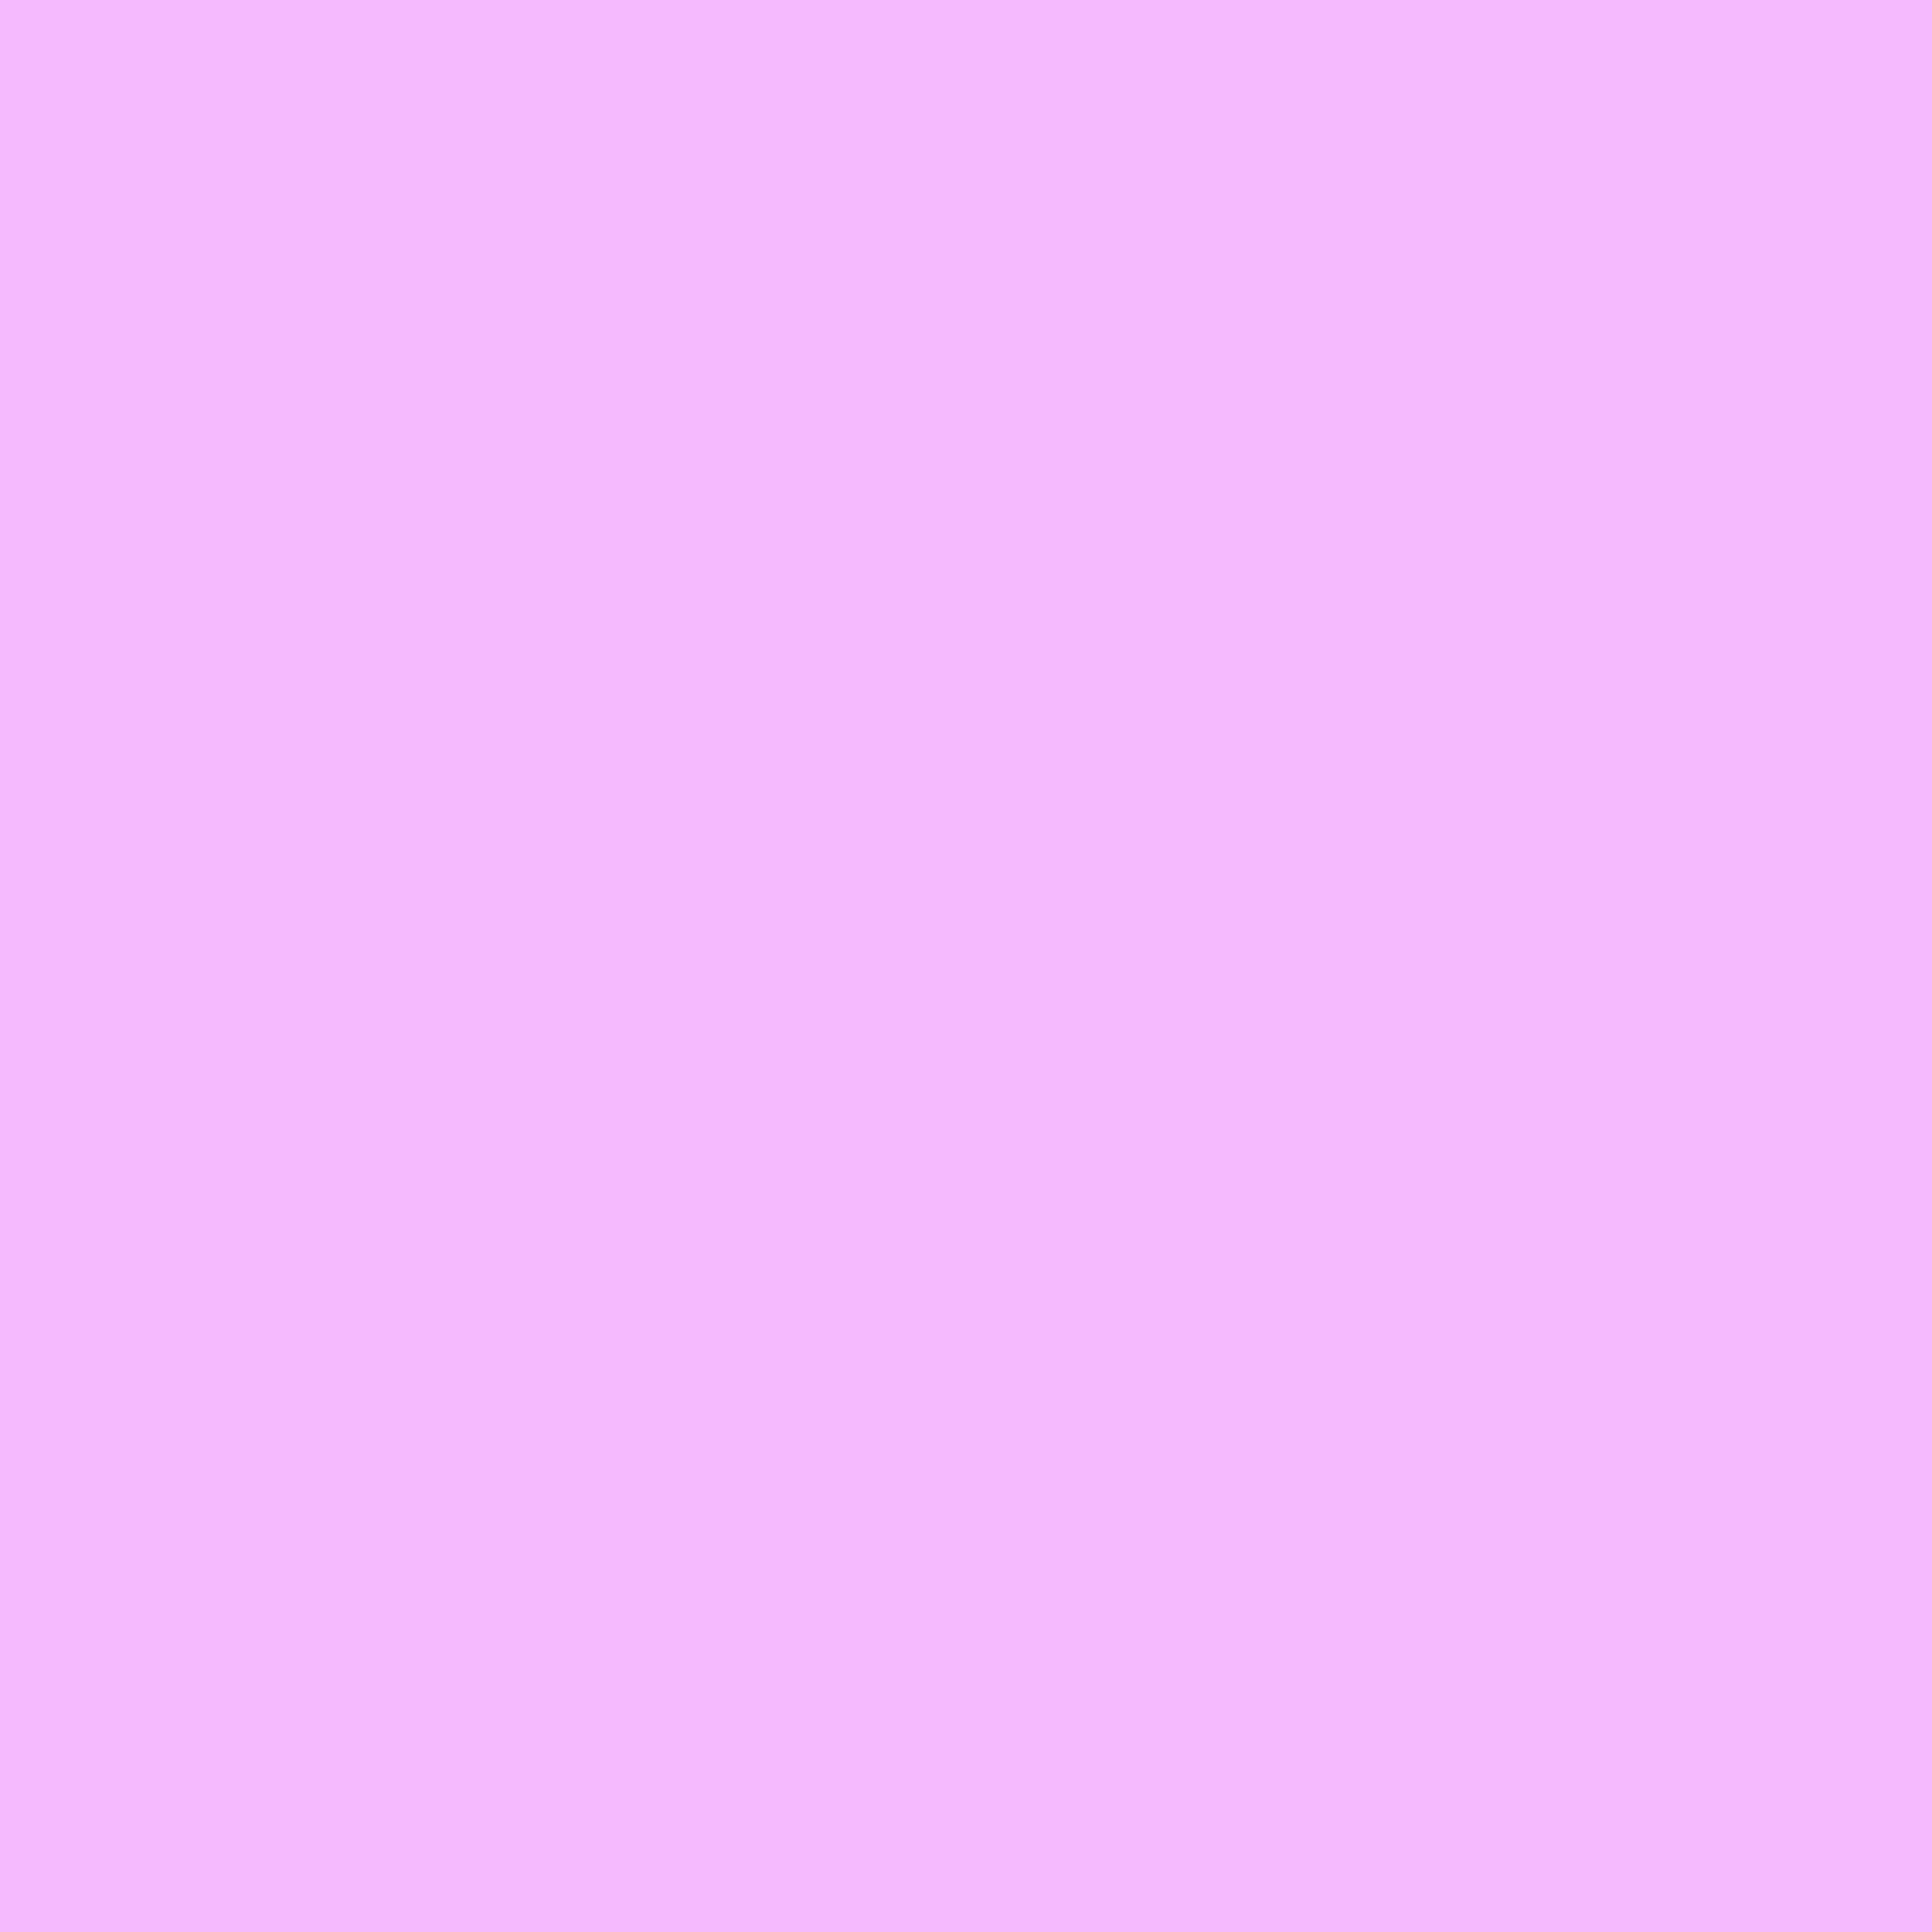 3600x3600 Brilliant Lavender Solid Color Background